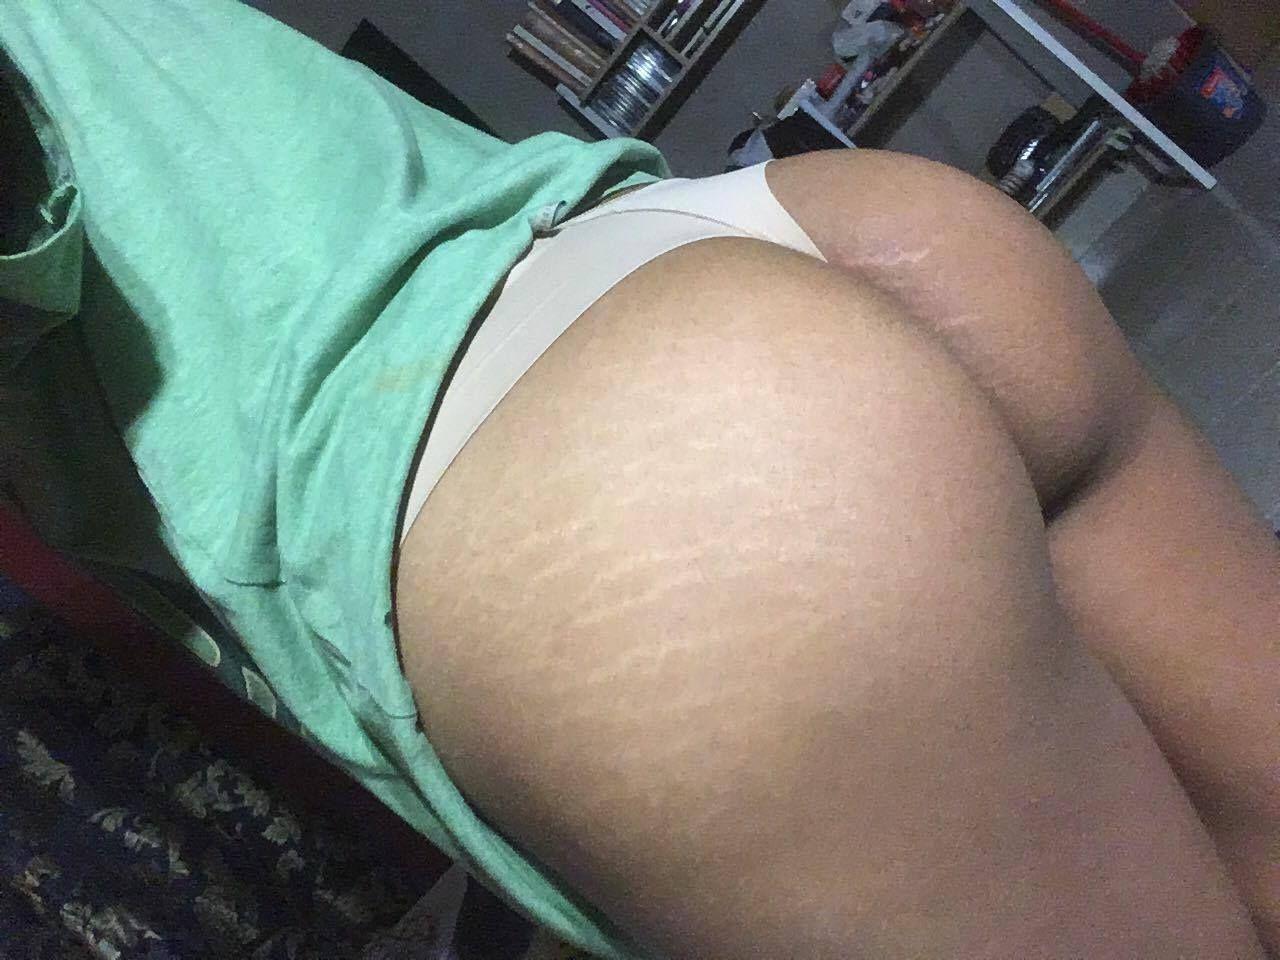 Morra Aisa Michelle con delicioso pack de Nudes caseras exquisitas. 2